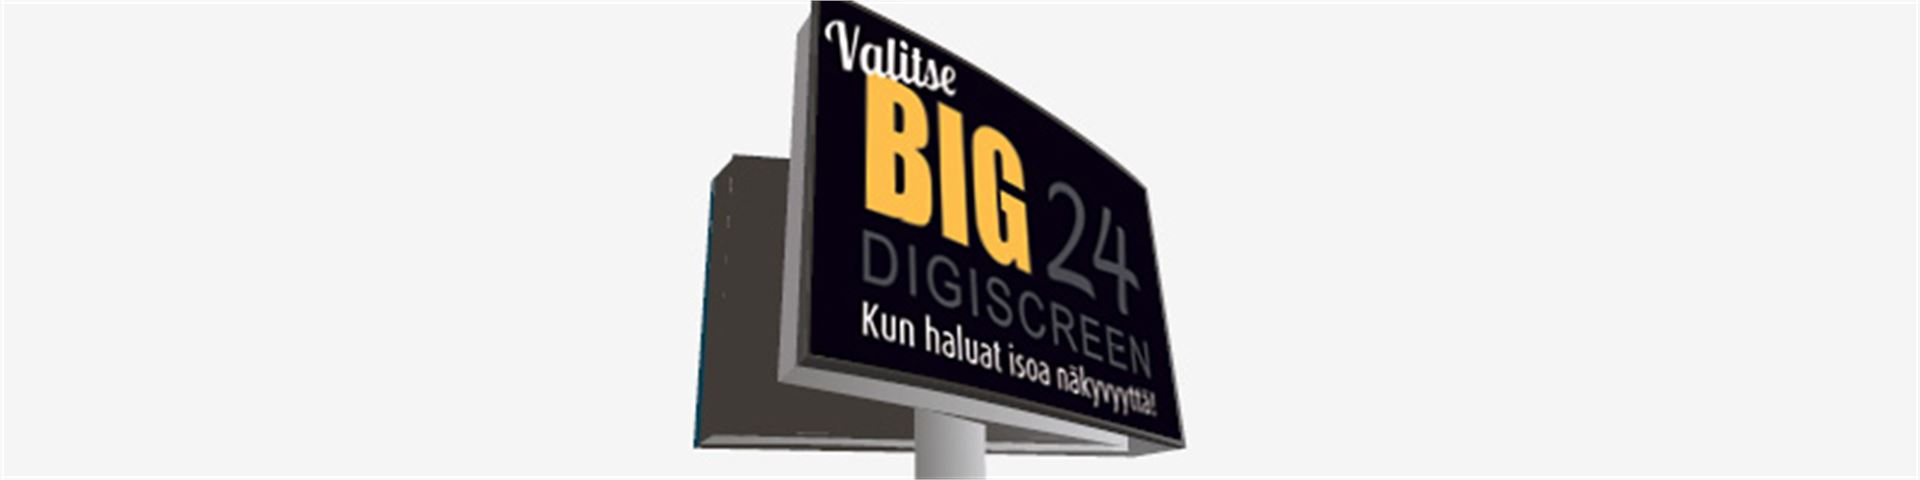 Big24 Talvi 2019